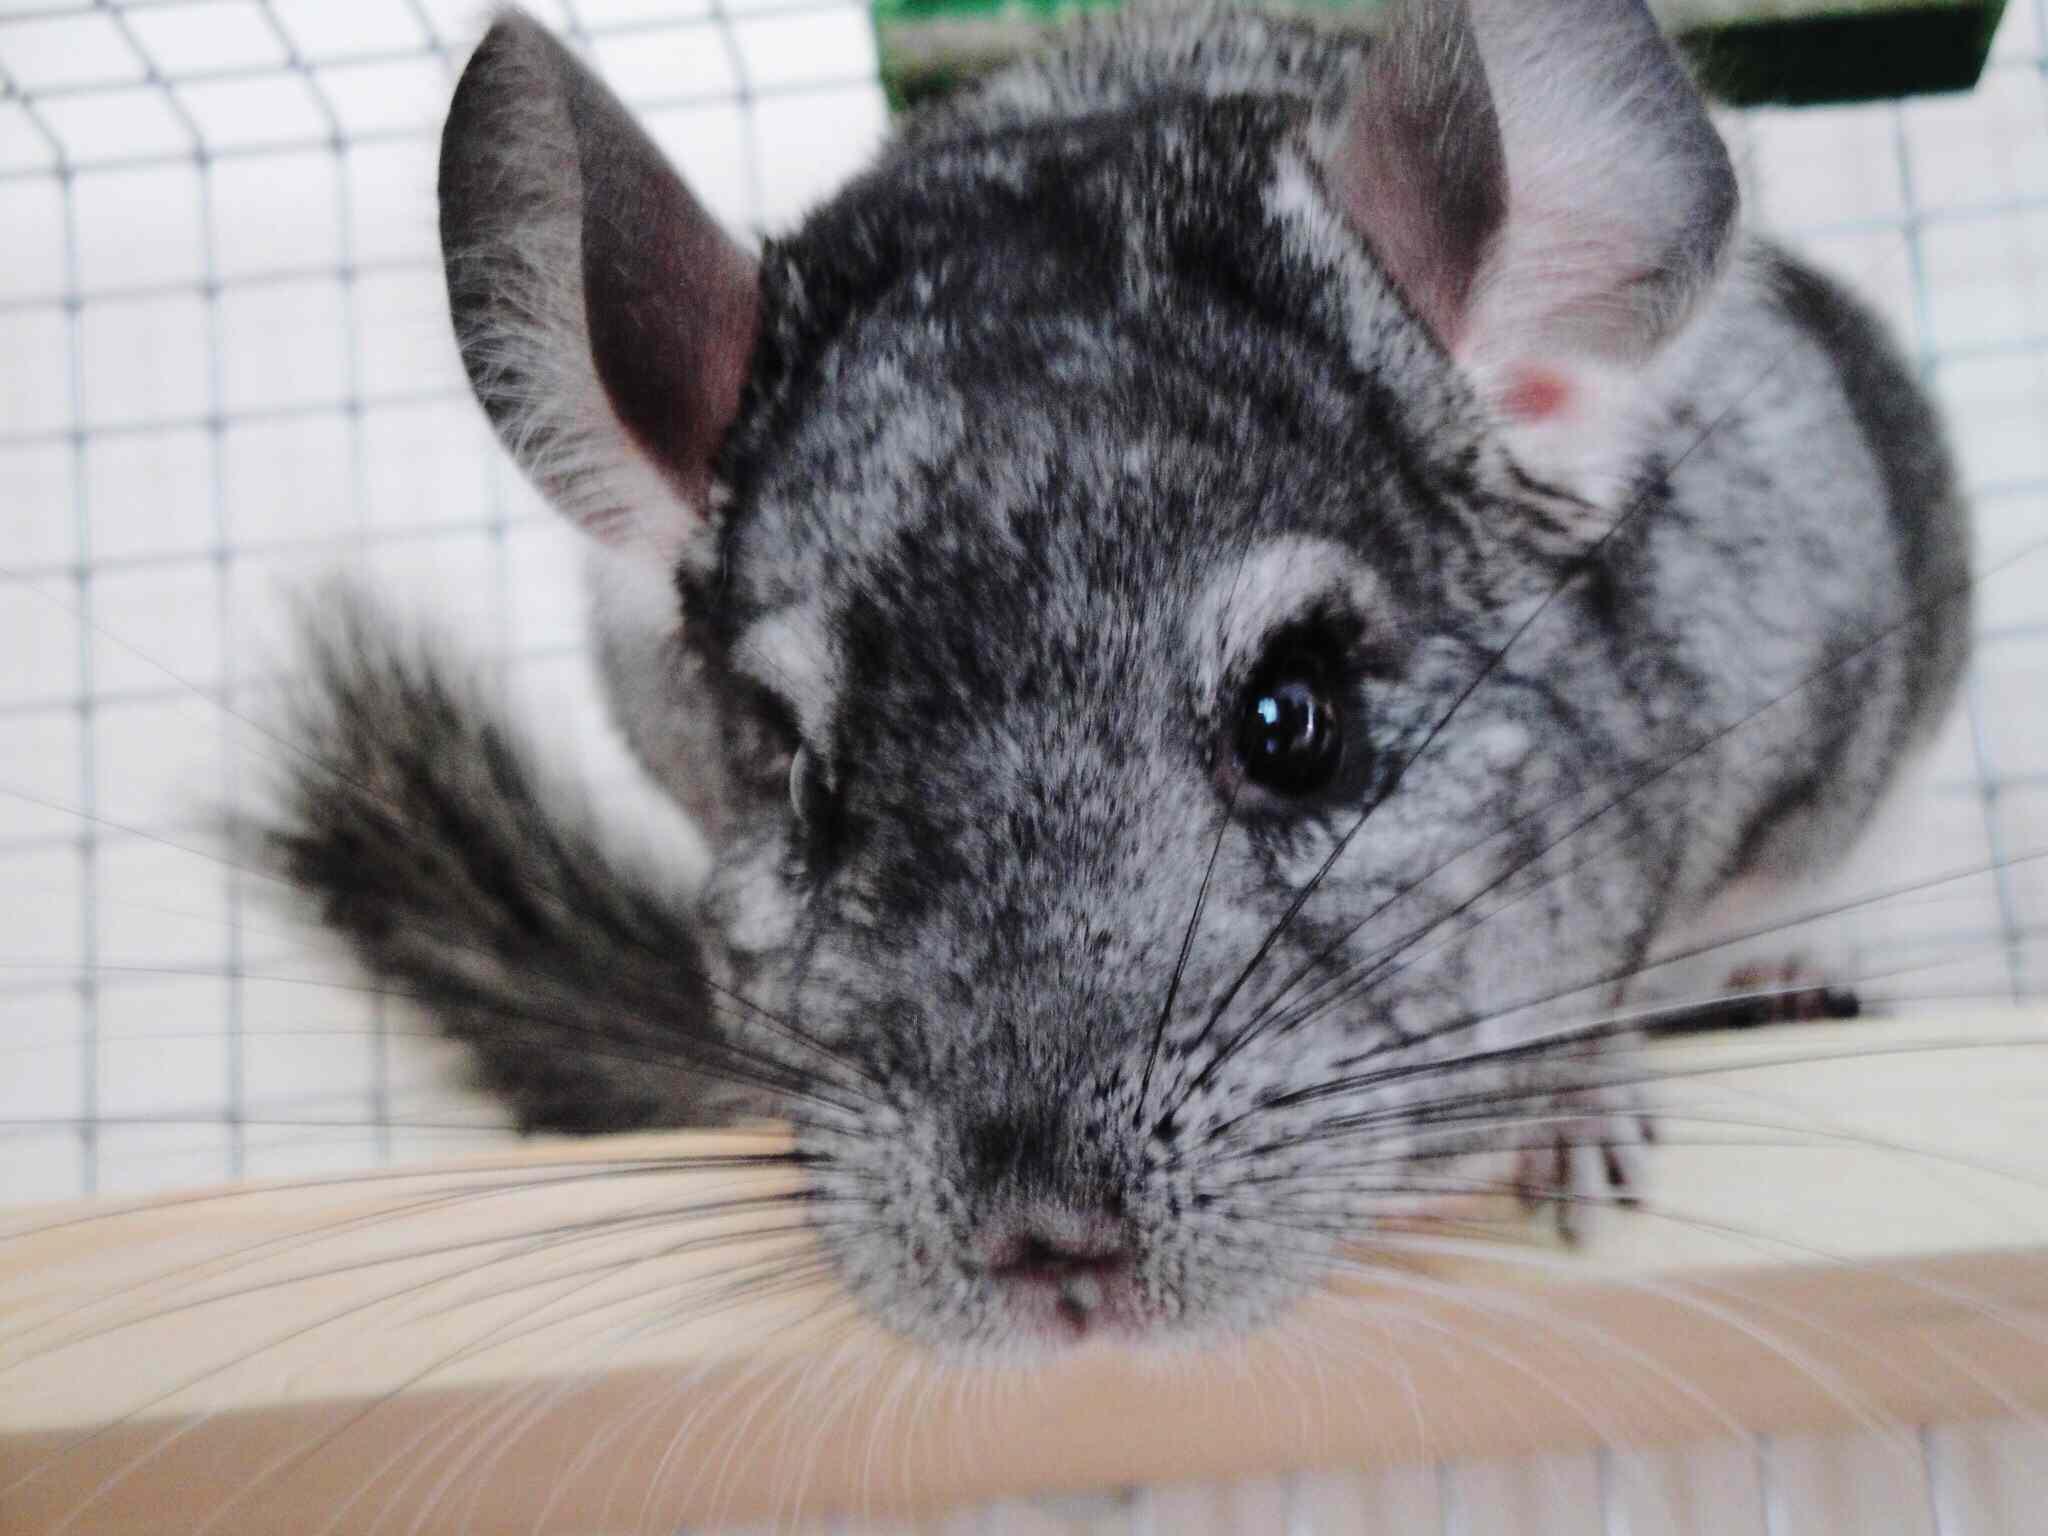 Closeup of a gray chinchilla